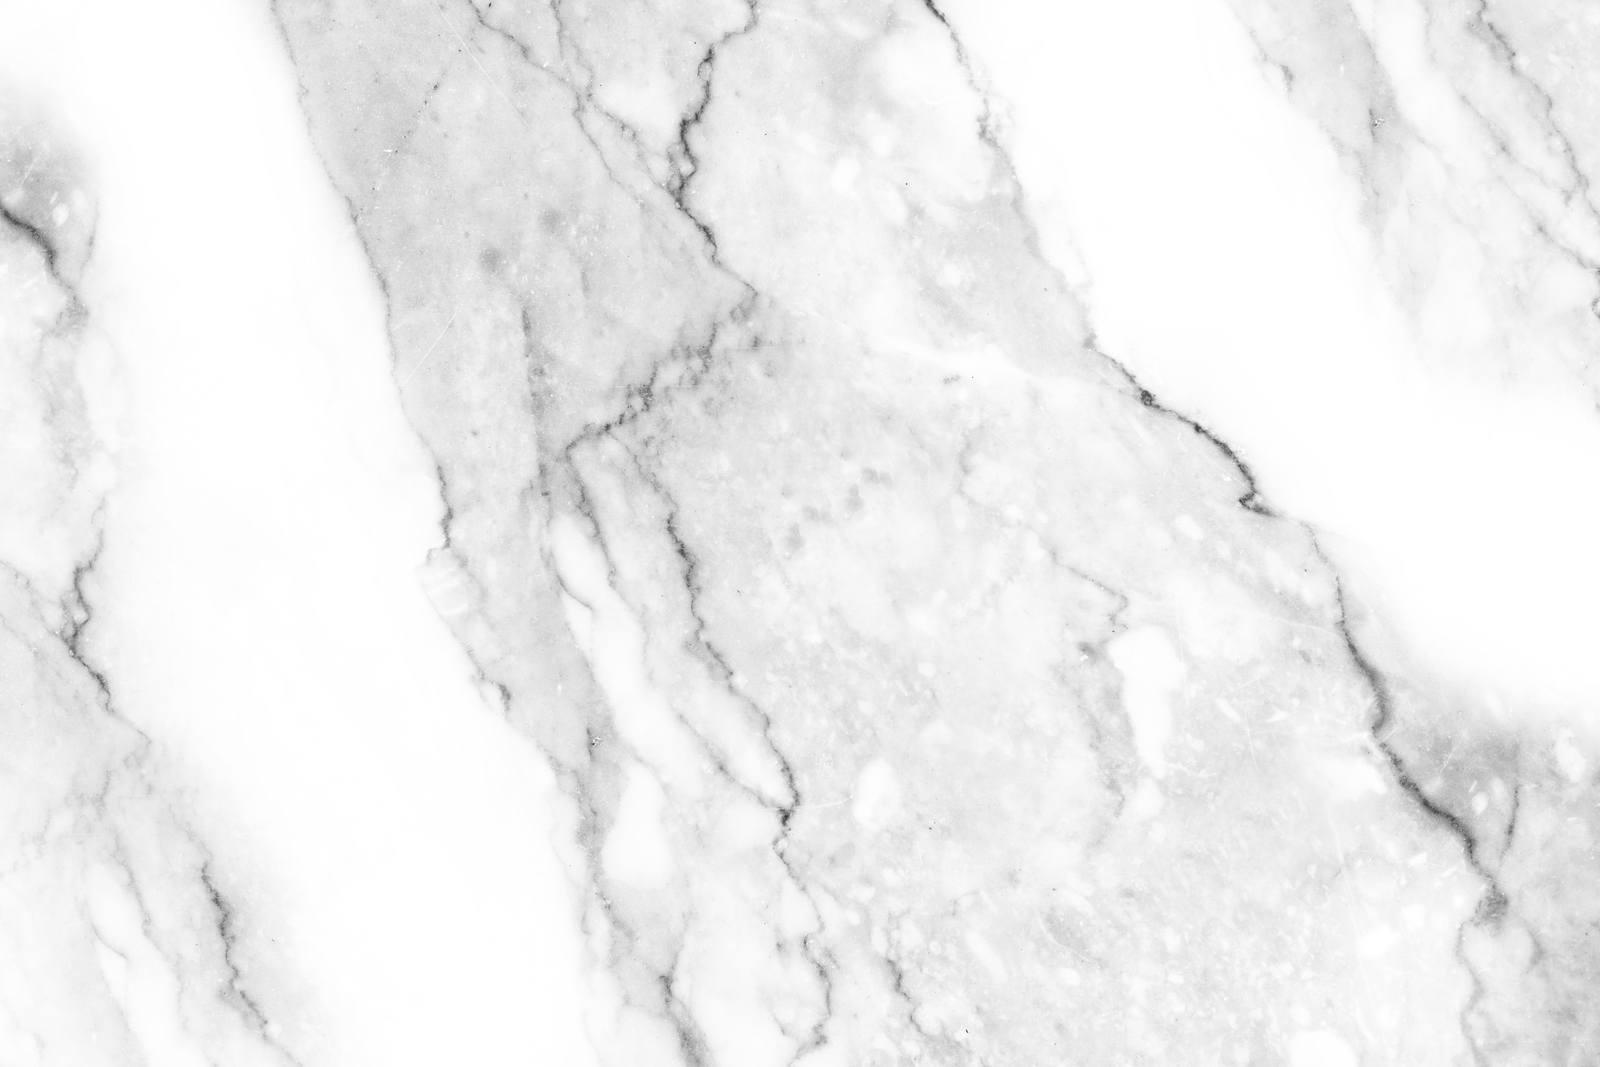 marble bathroom countertop texture